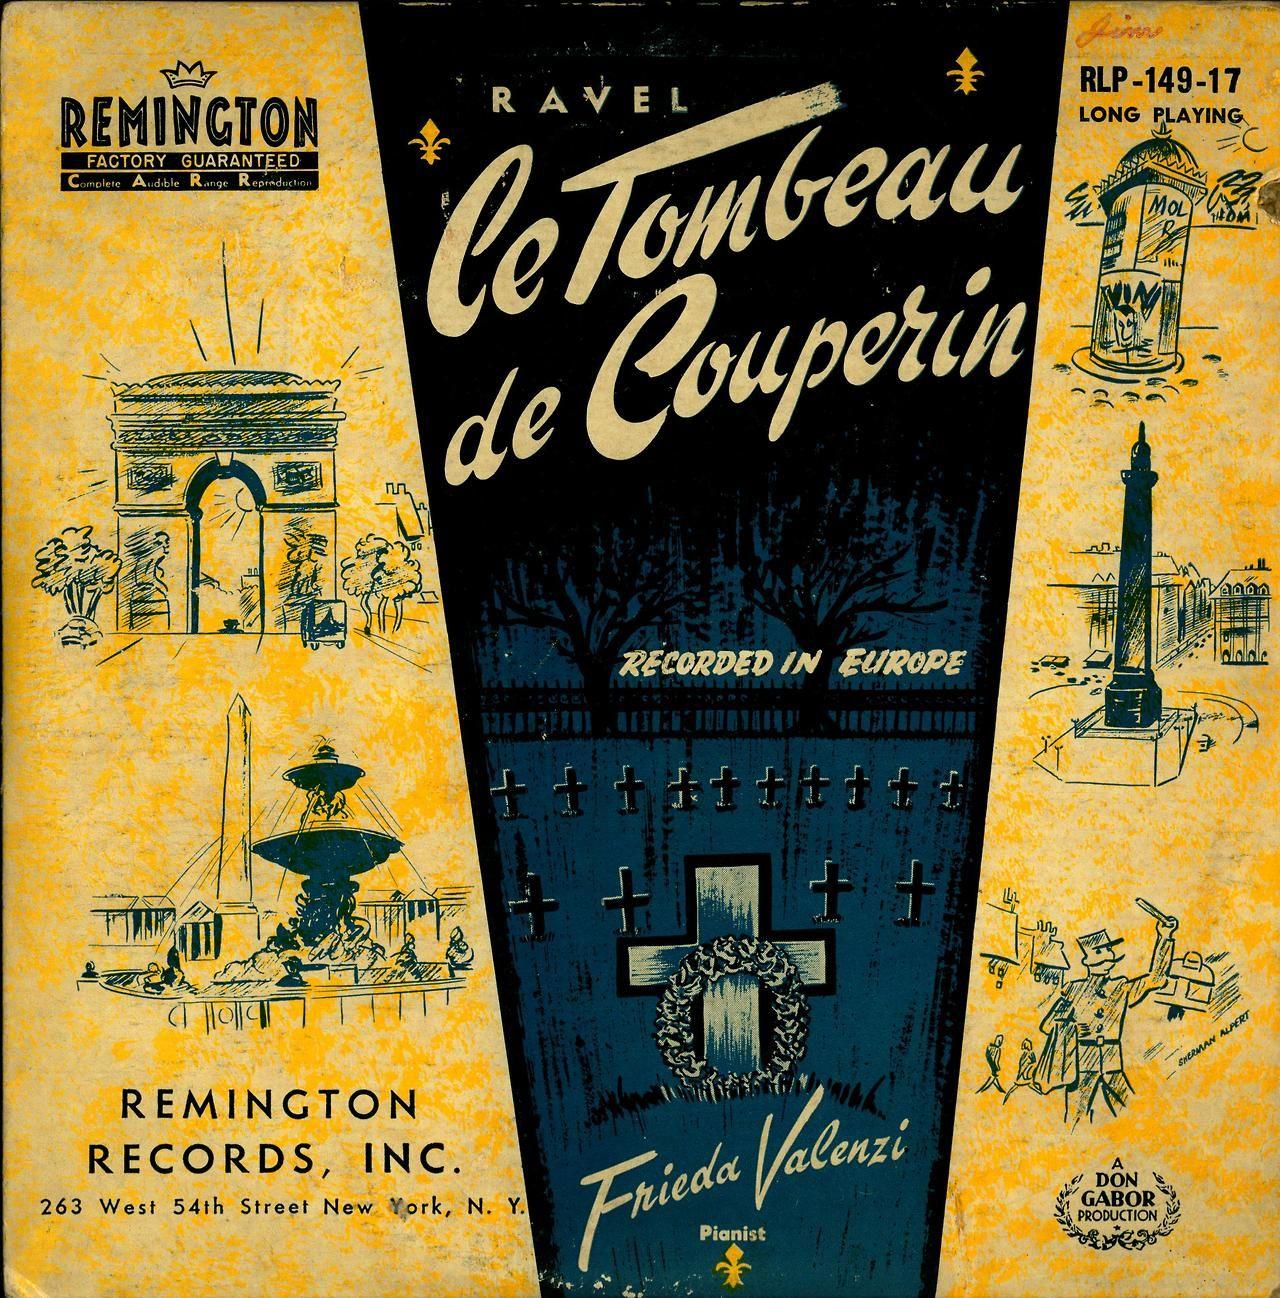 Ravel- Le Tombeau de Couperin Frieda Valenzi, piano Remington Records Inc. RLP-149-17 (1951) Cover Art by Sherman Alpert